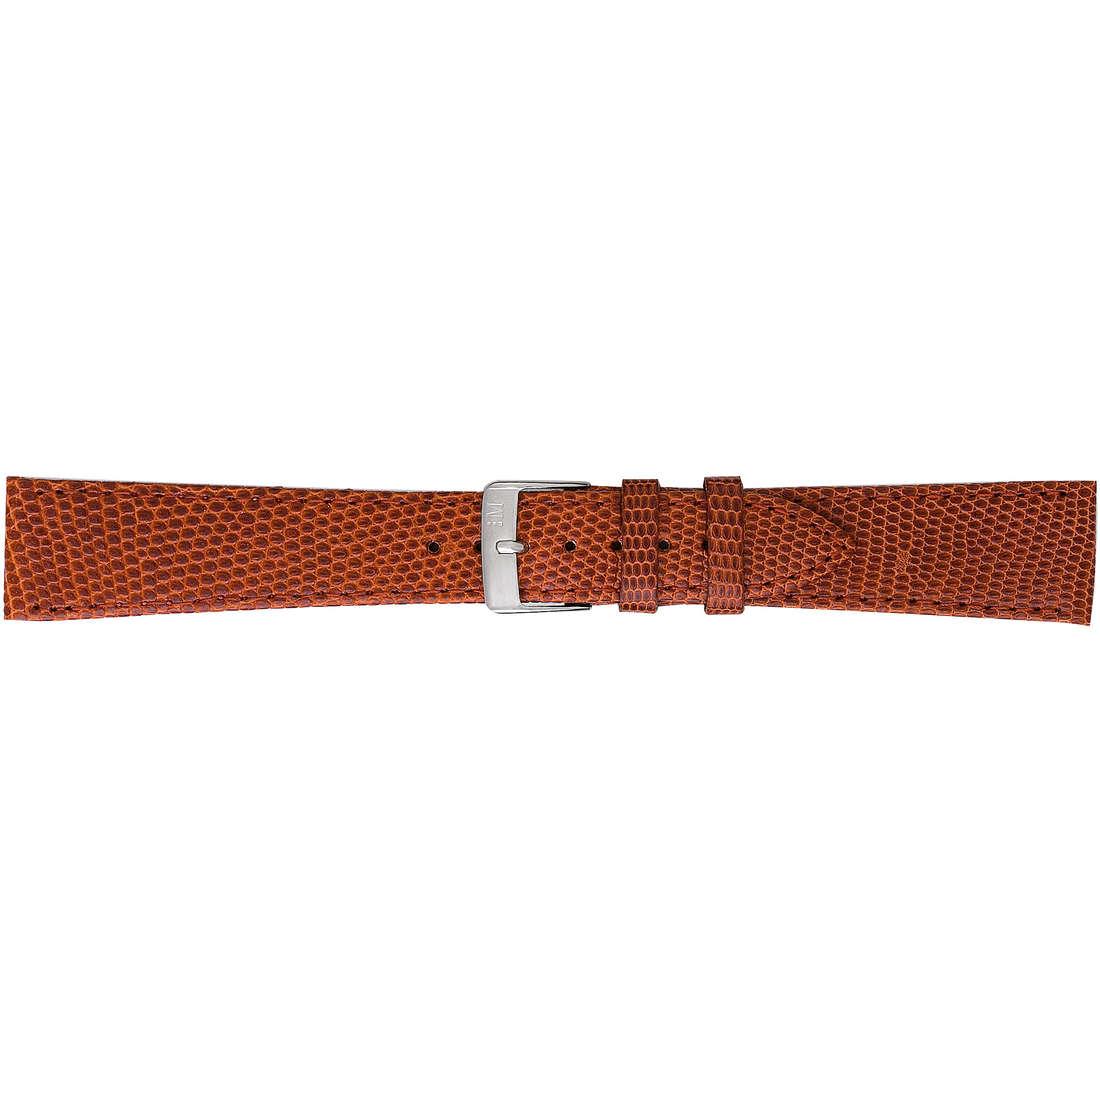 watch watch bands watch straps man Morellato Pelli Preziose A01U0858040041CR18